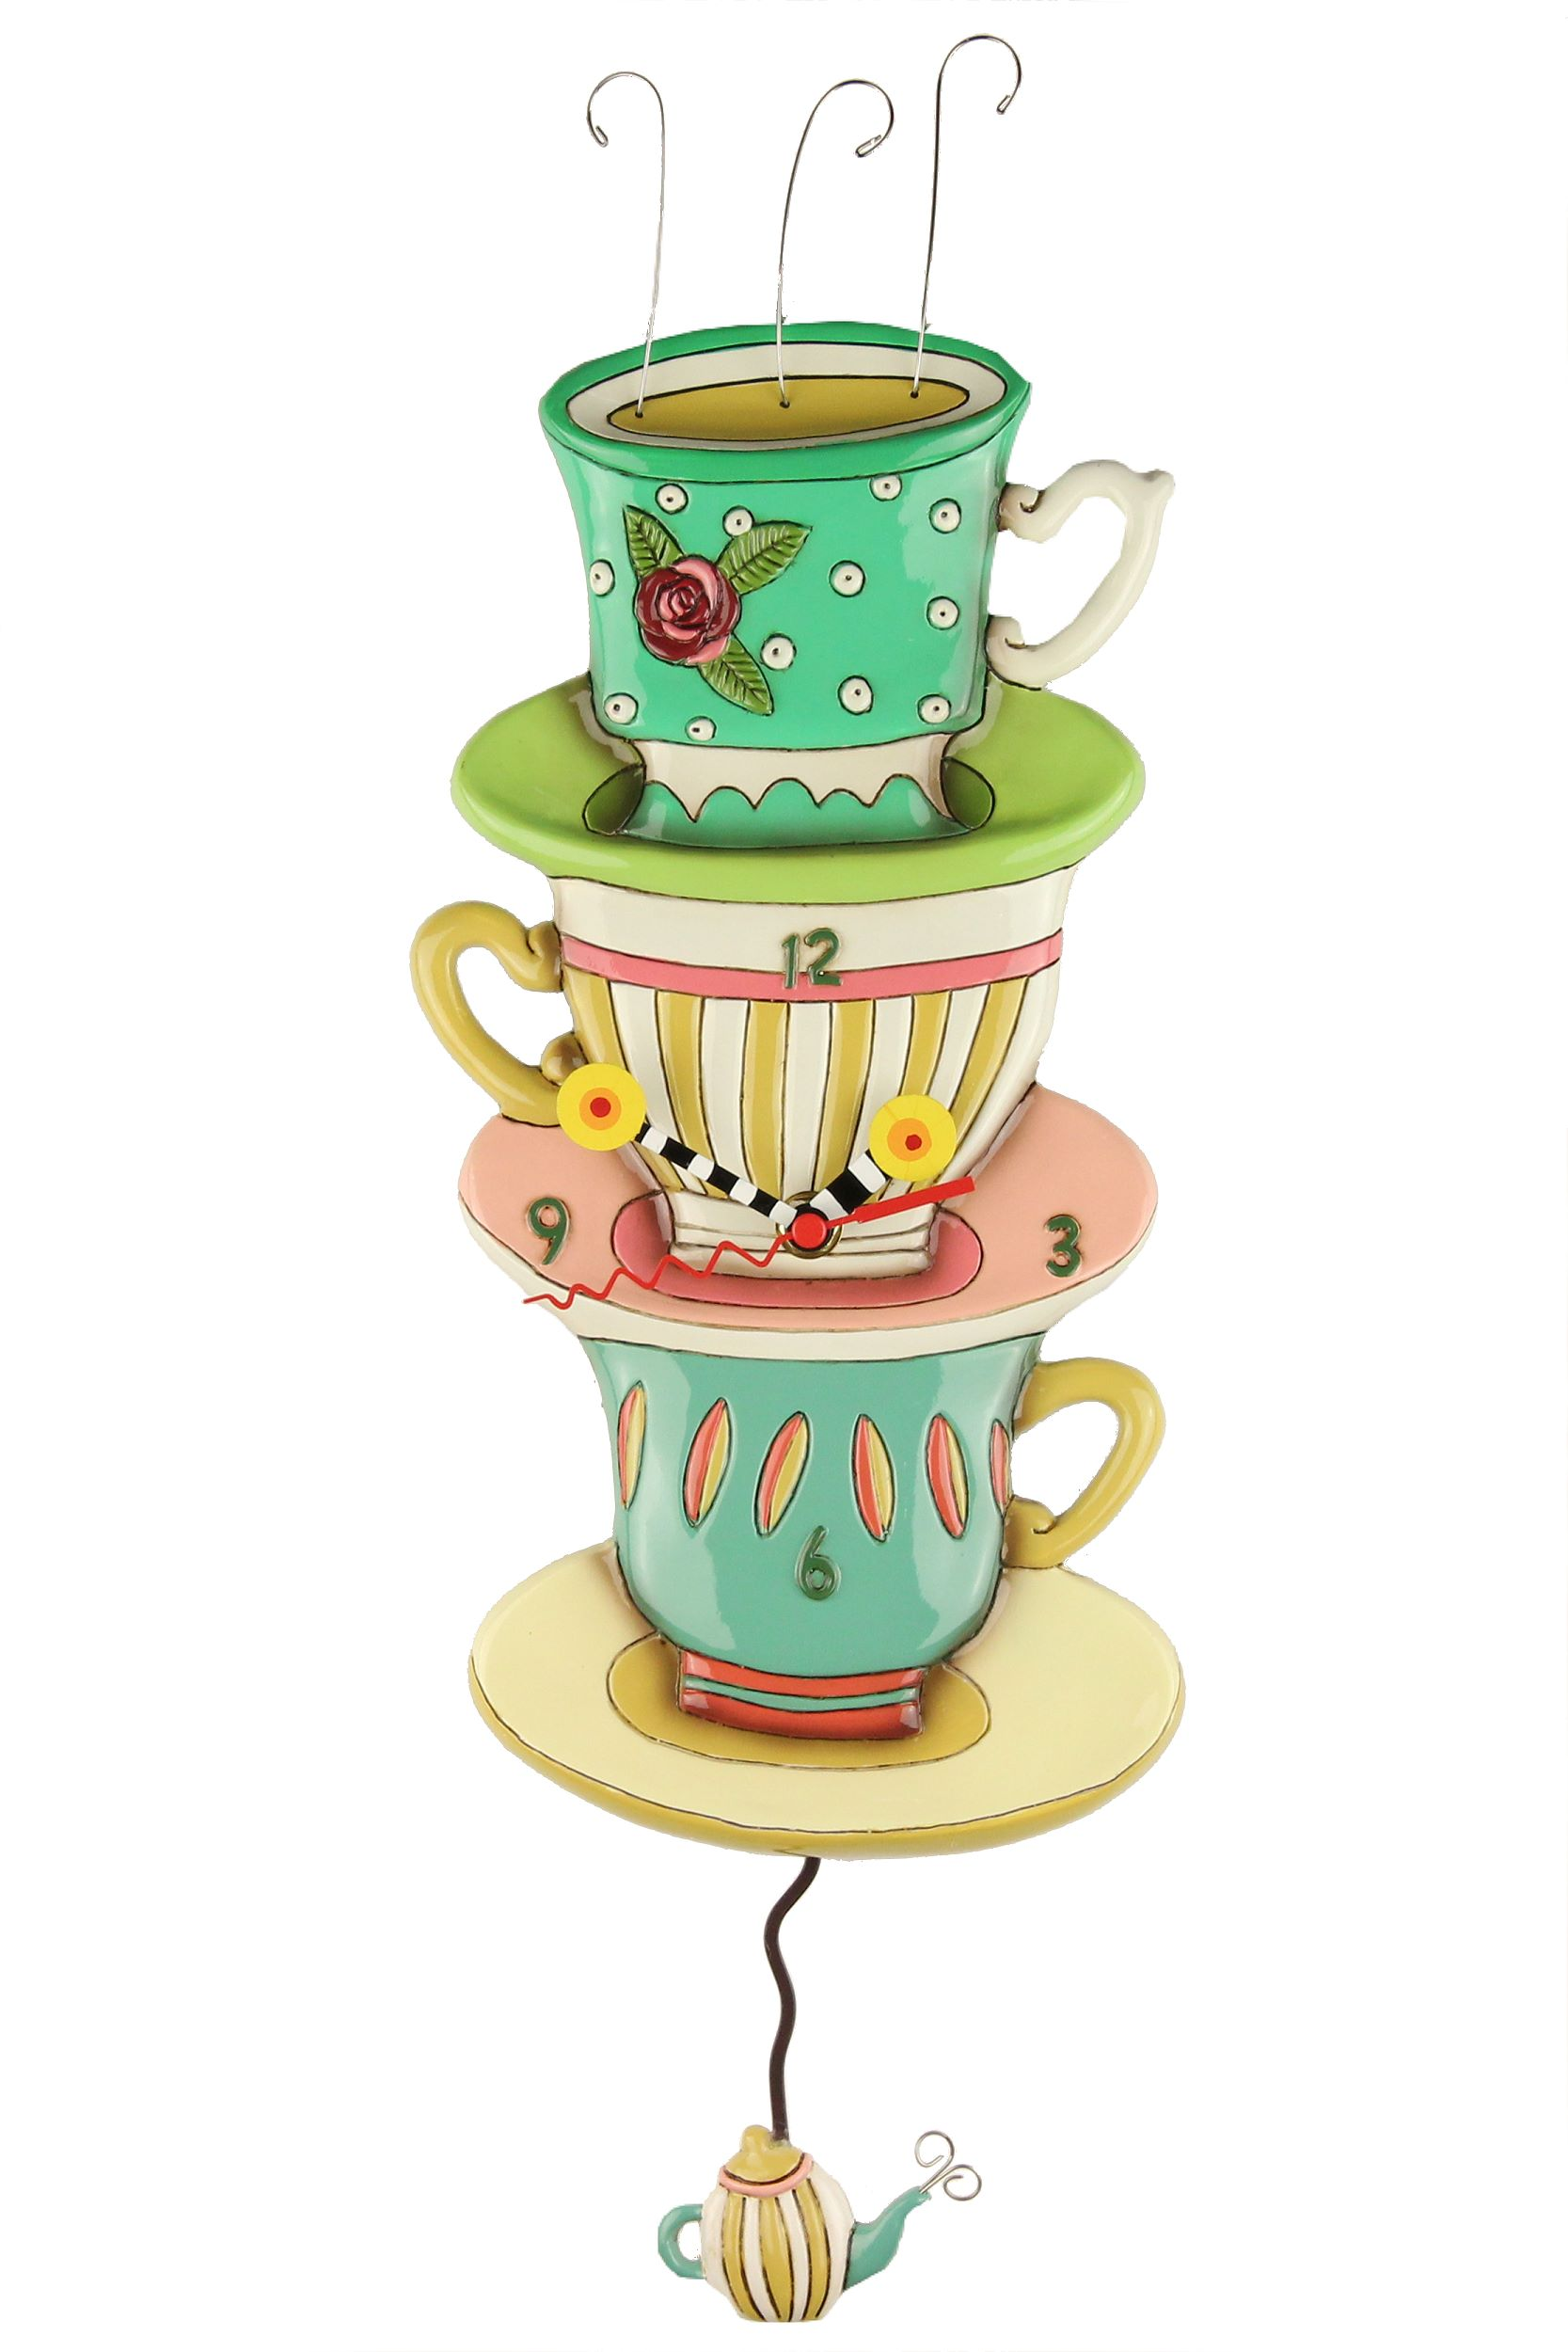 Allen Design -Teacups- P1502